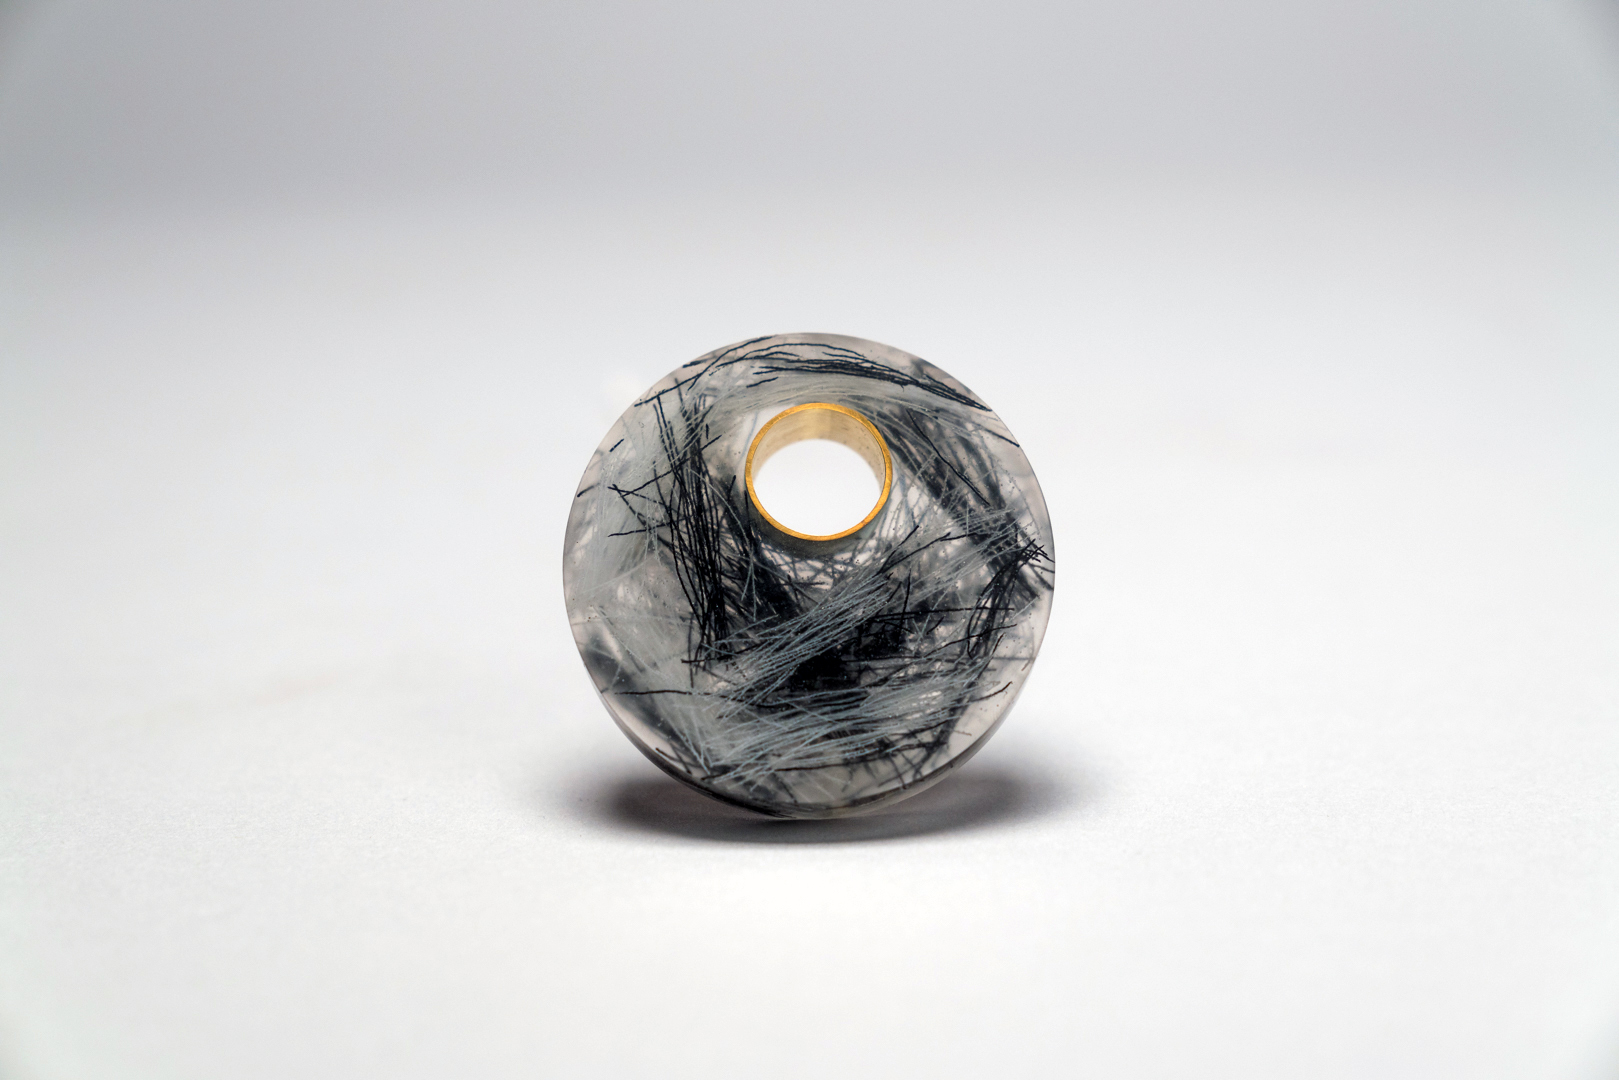 Jiaqi Li  Moon Night  Brooch (2018) Resin, silver, brass, threads Image credit: Zip Tao Zhang